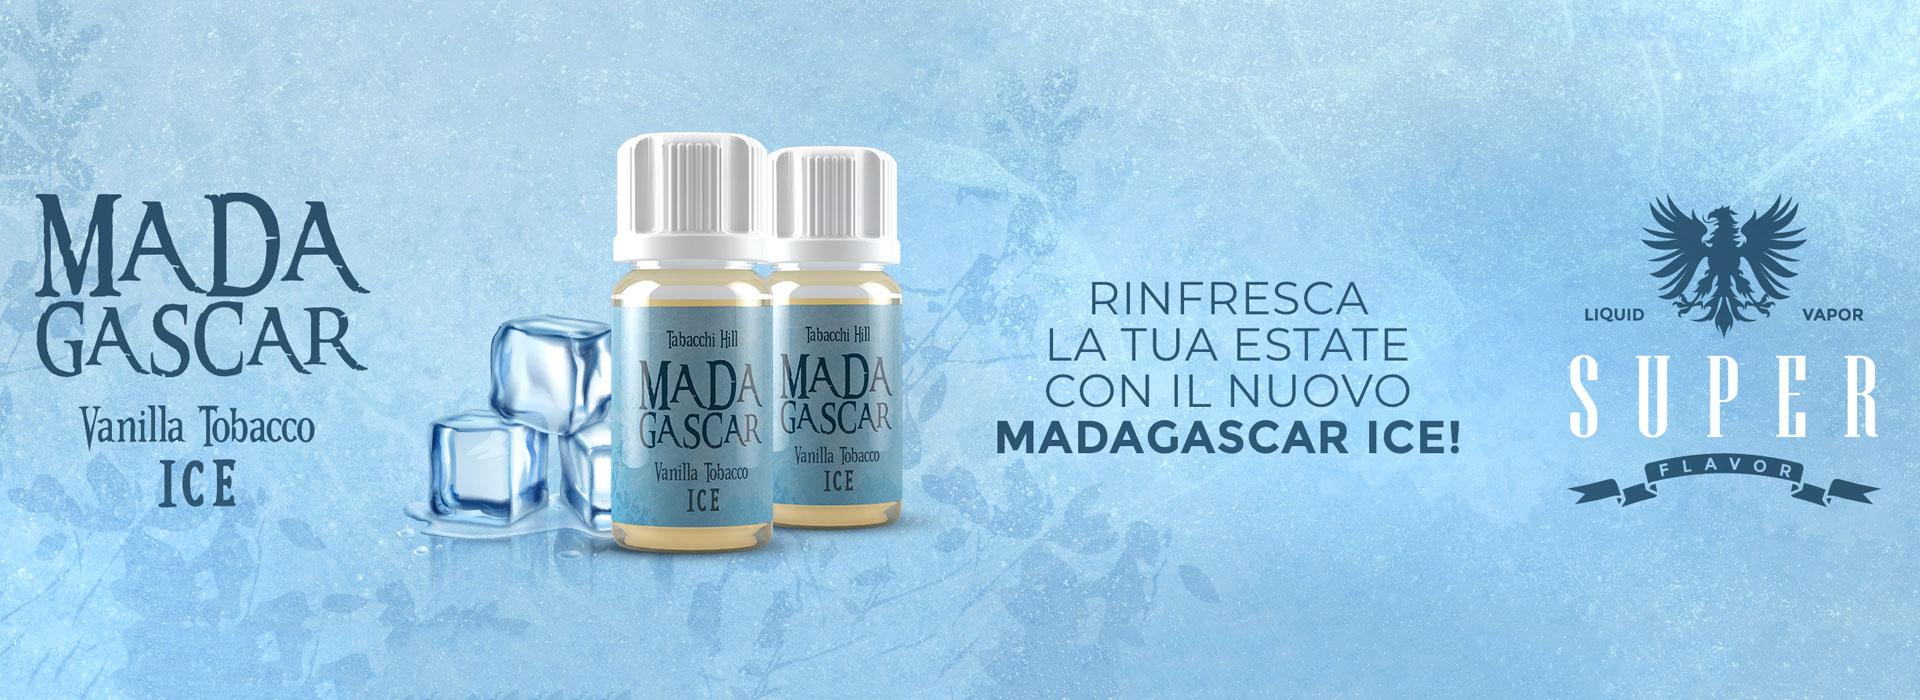 Madagascar Ice